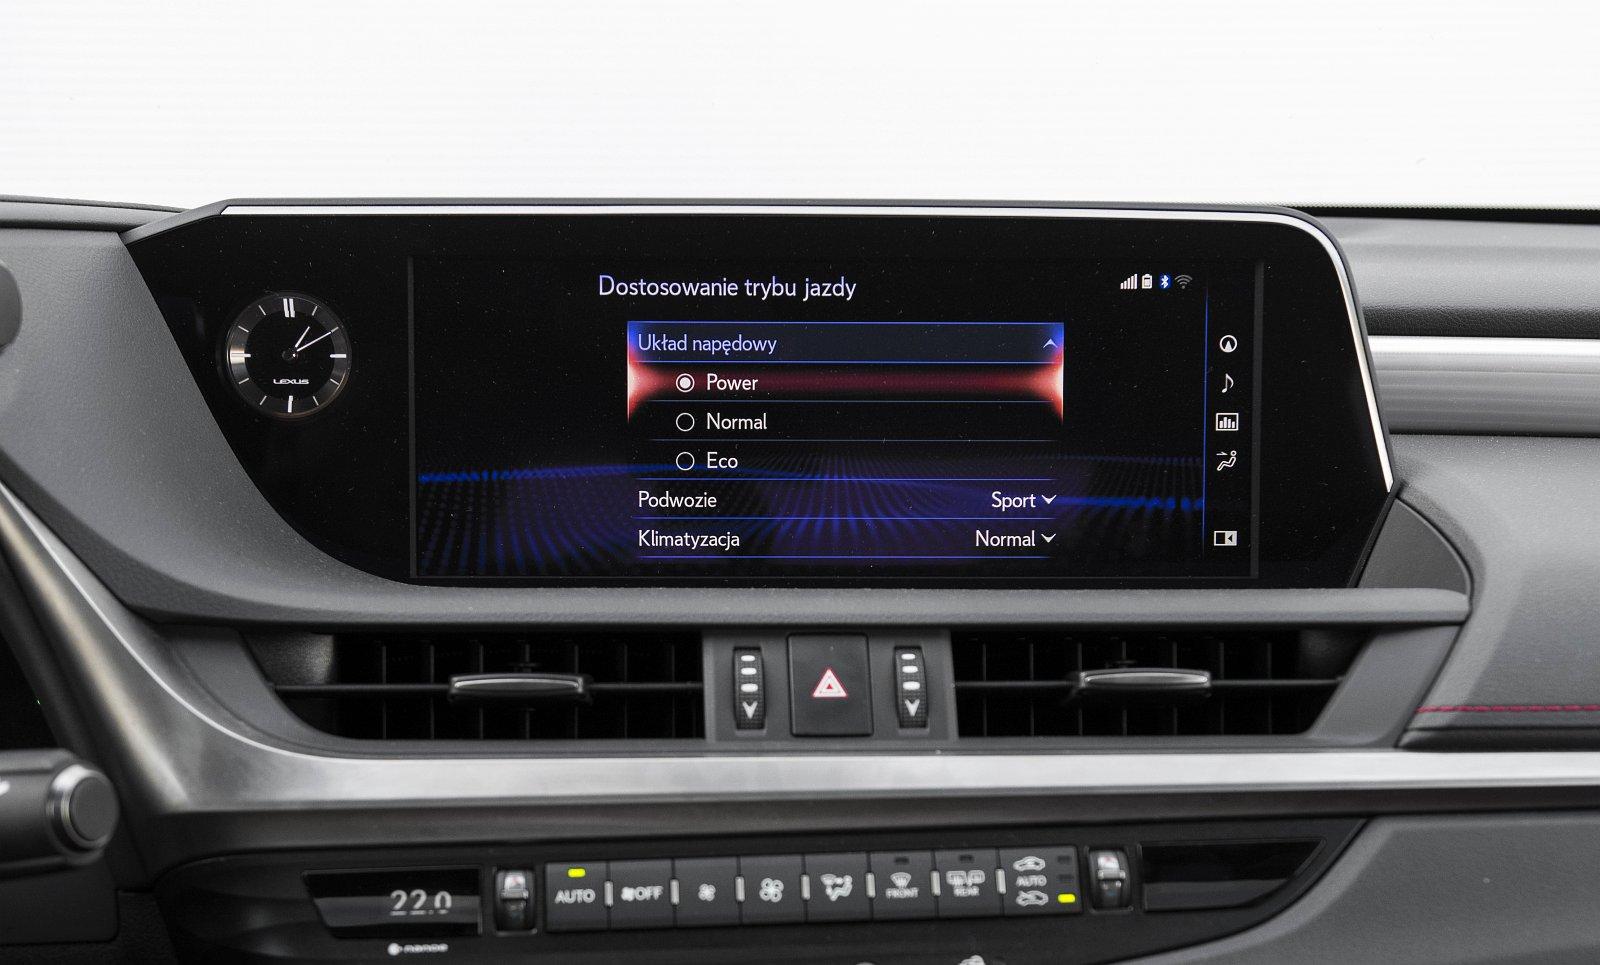 Lexus ES 300h F Sport Edition test 2020 - system multimedialny 03